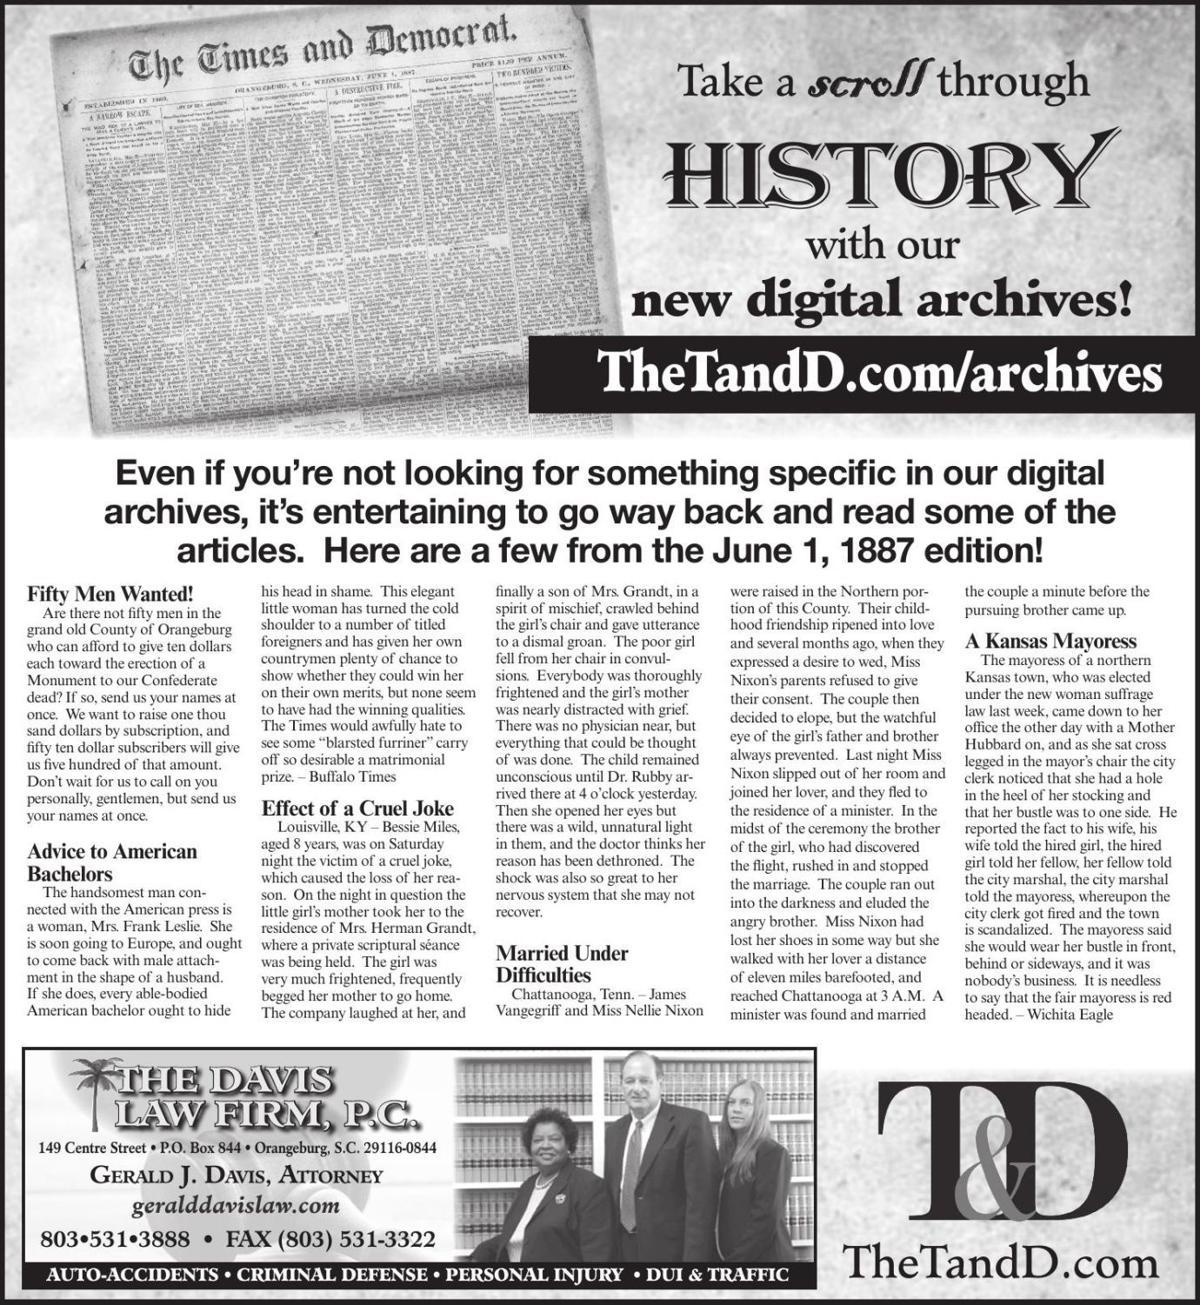 TheTandD.com/archives June 2, 2019